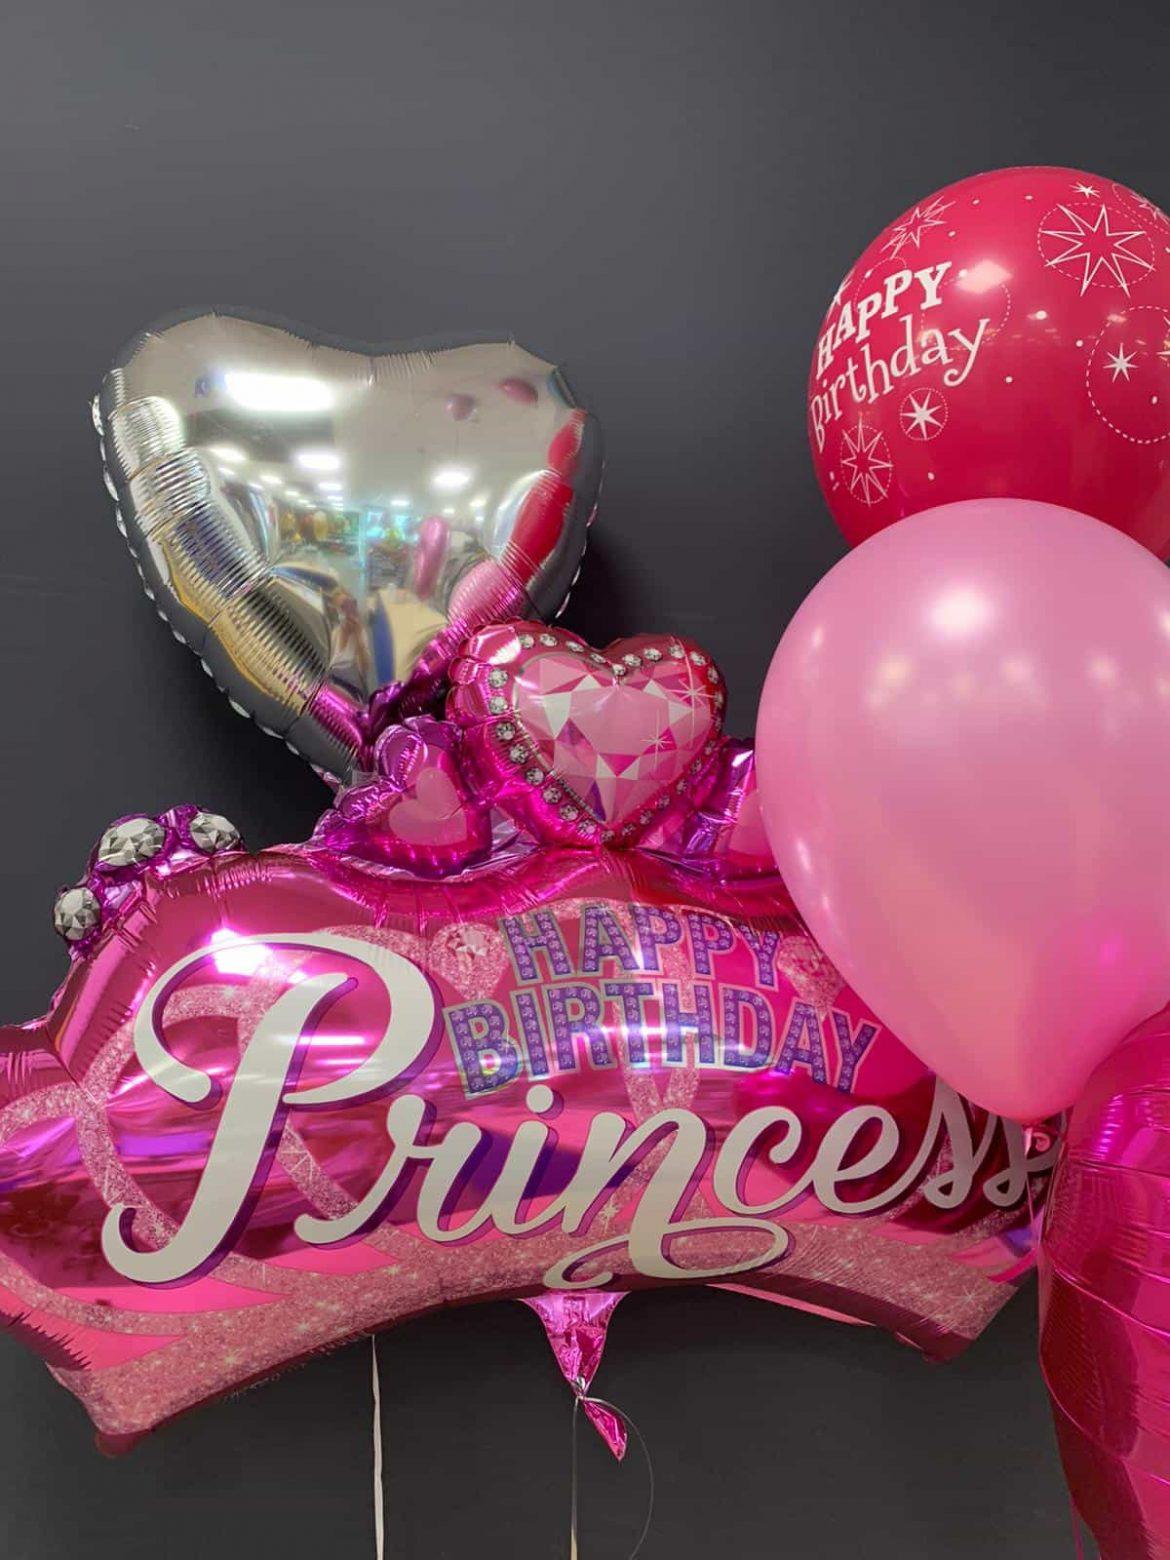 Princess Birthday € 7,90 <br />Dekoballon € 4,50 <br /> Latexballons ab € 1,95 1